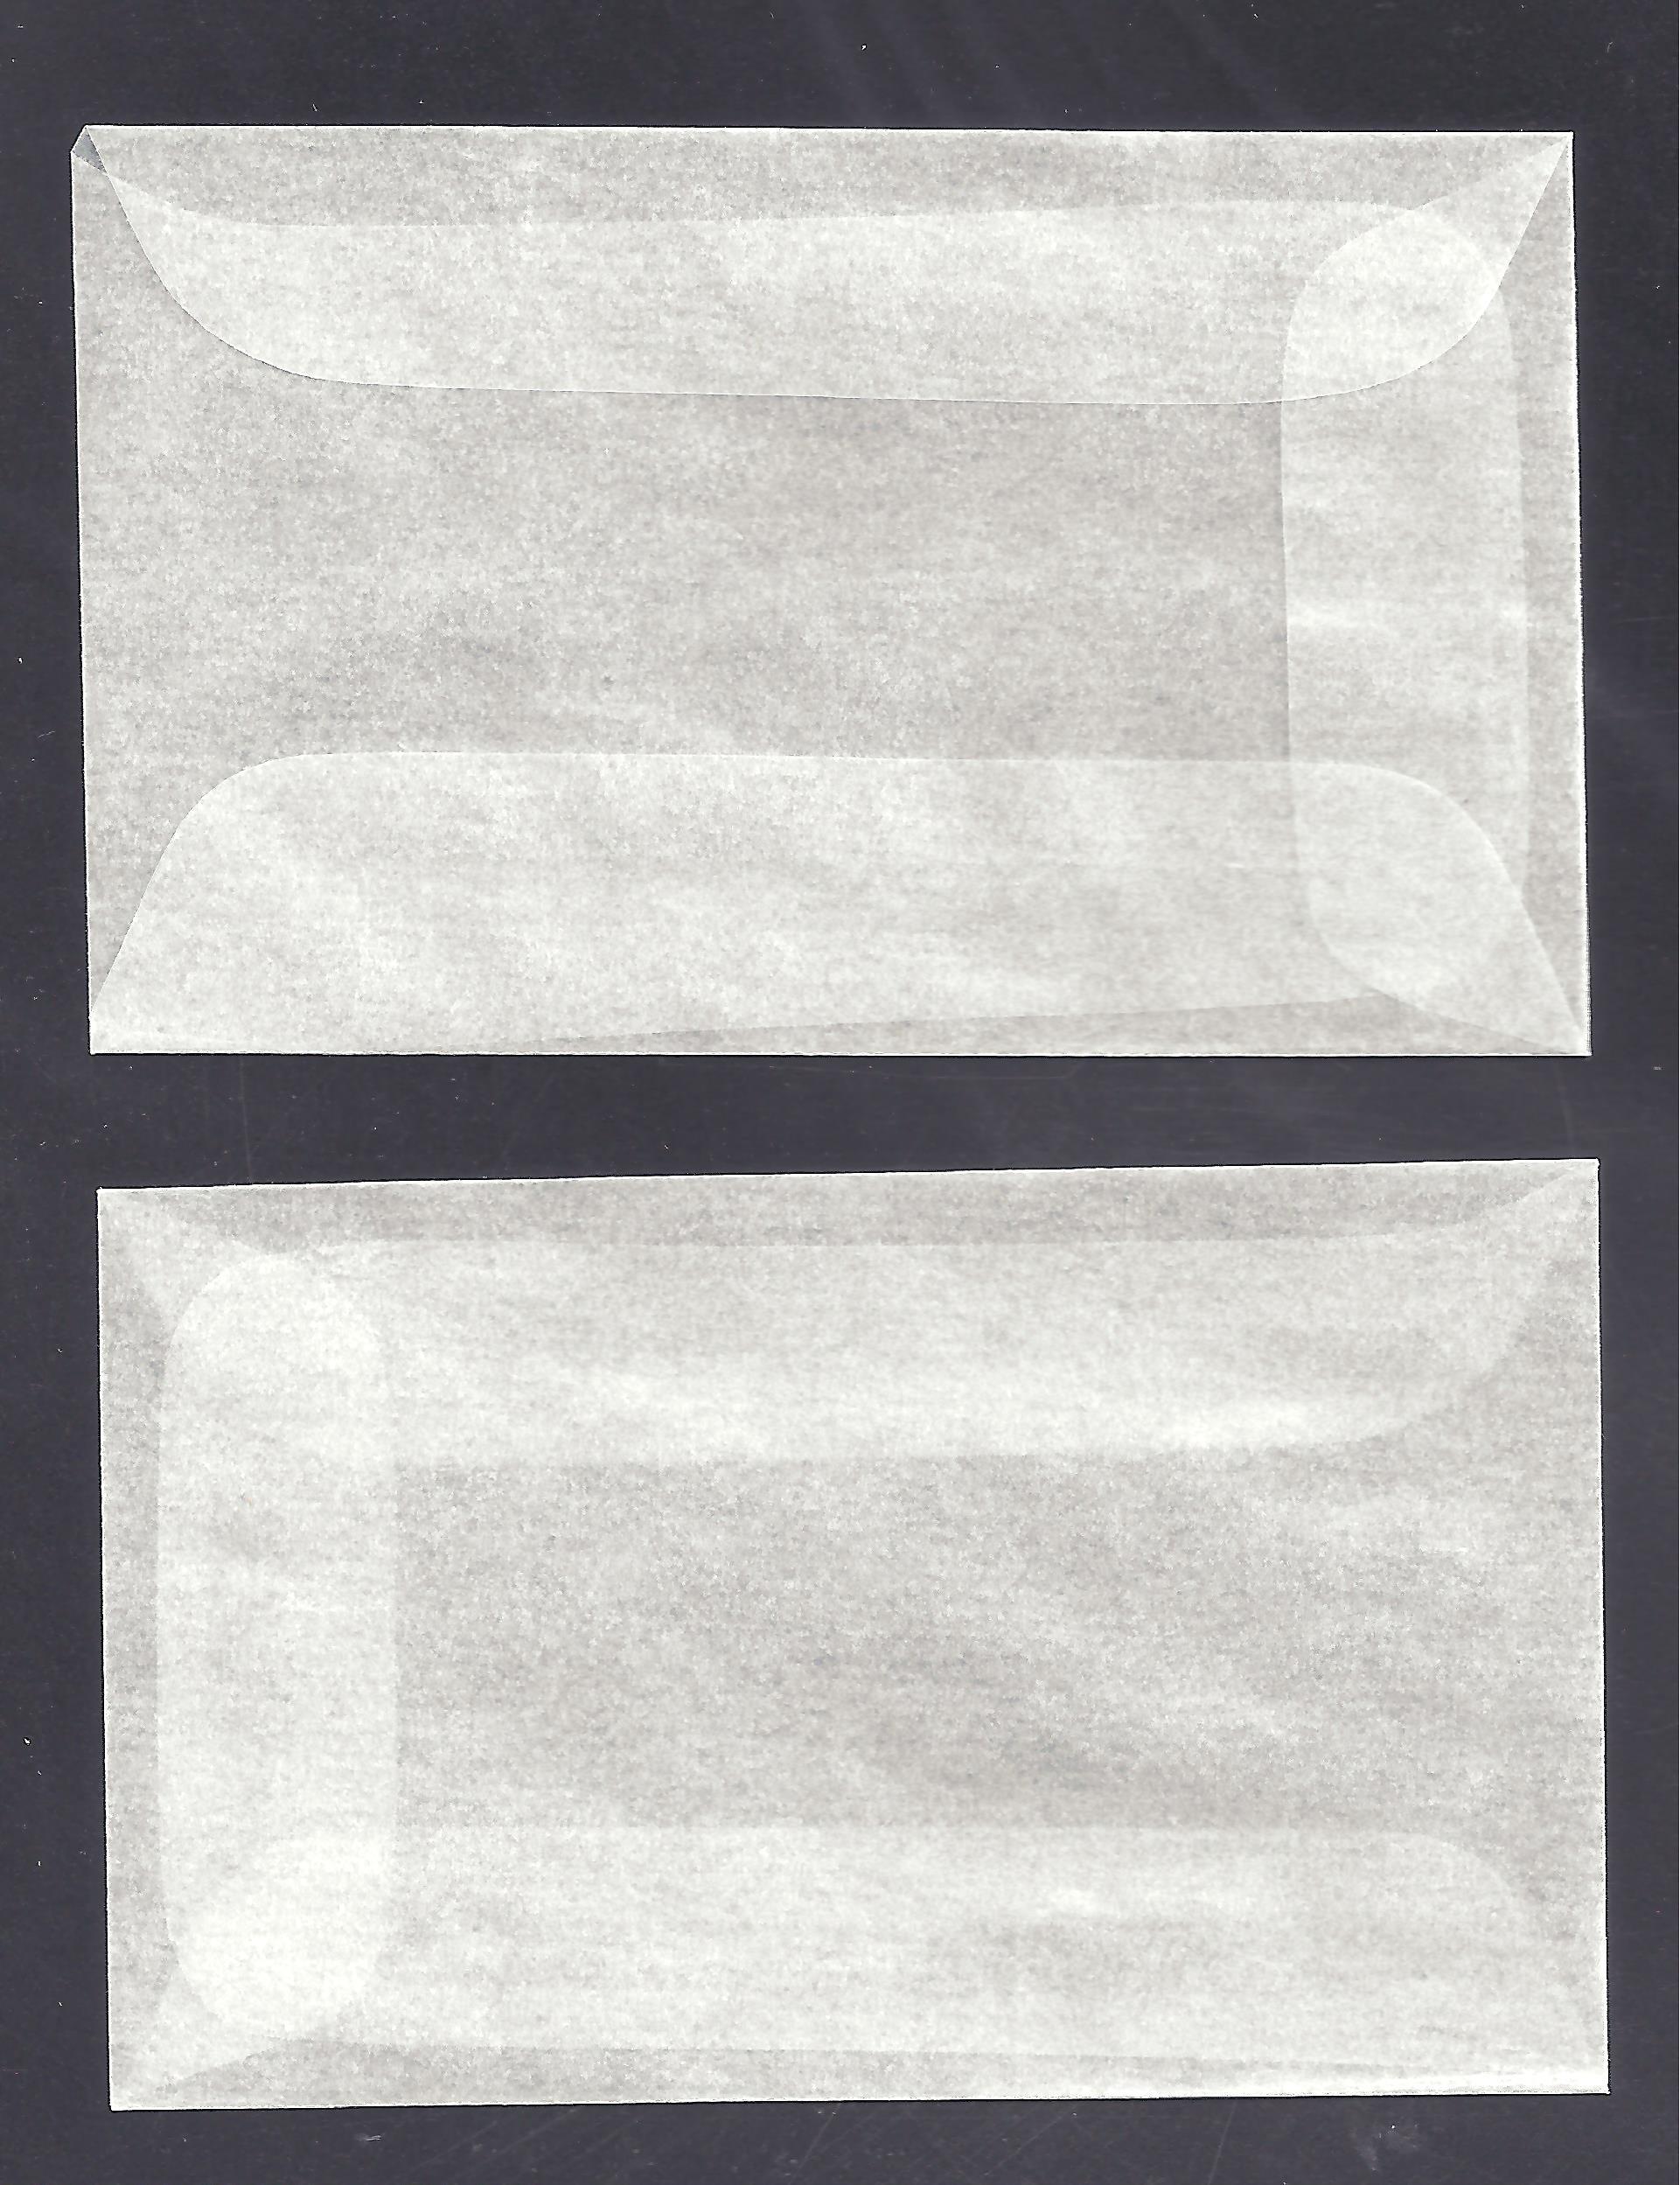 1,000 #1 GLASSINE ENVELOPES -- 1 3/4 x 2 7/8 INCHES